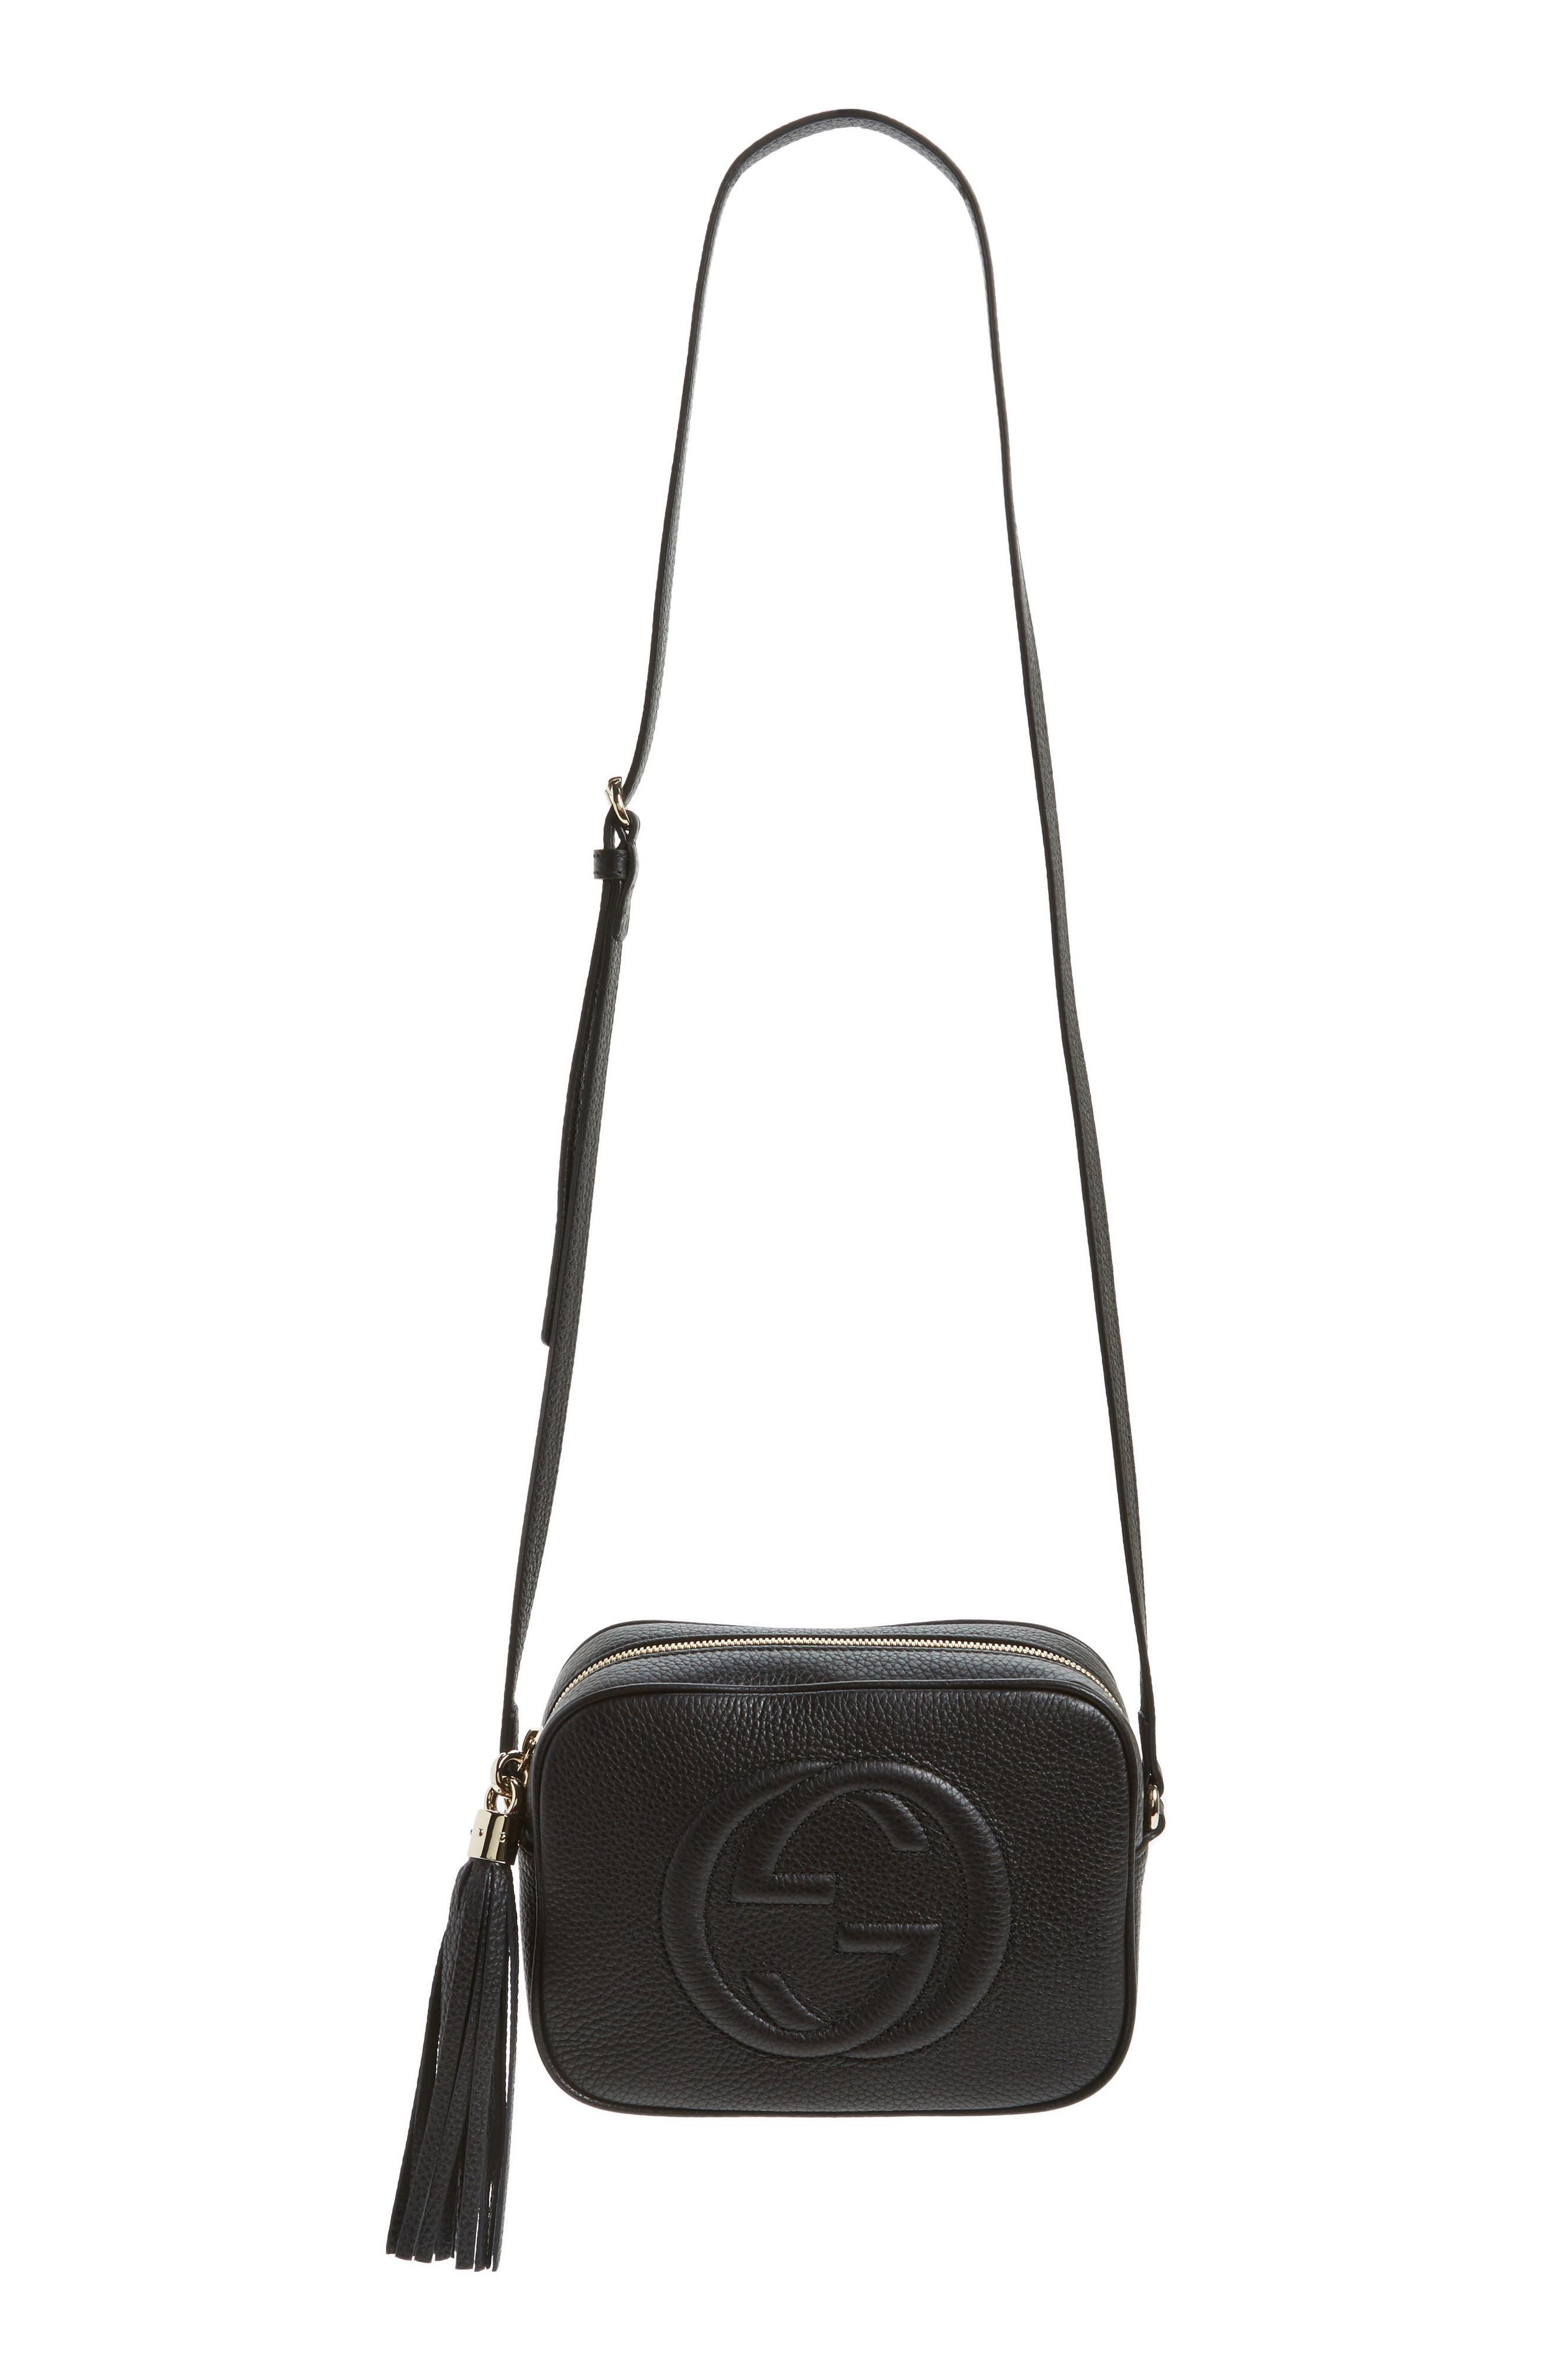 black gucci bags. main image - gucci soho disco leather bag black bags